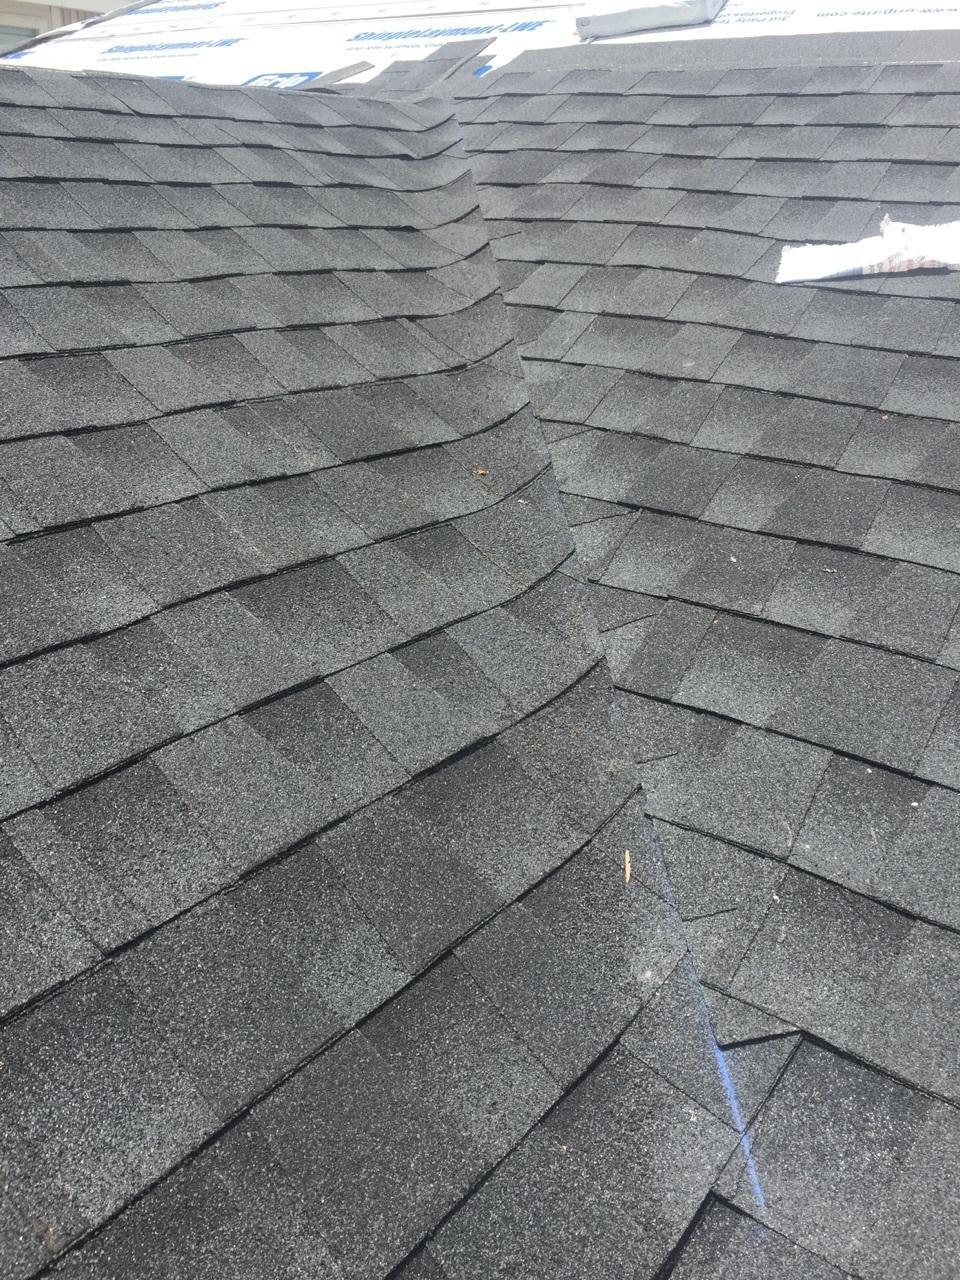 Veritas Roofing LLC image 3